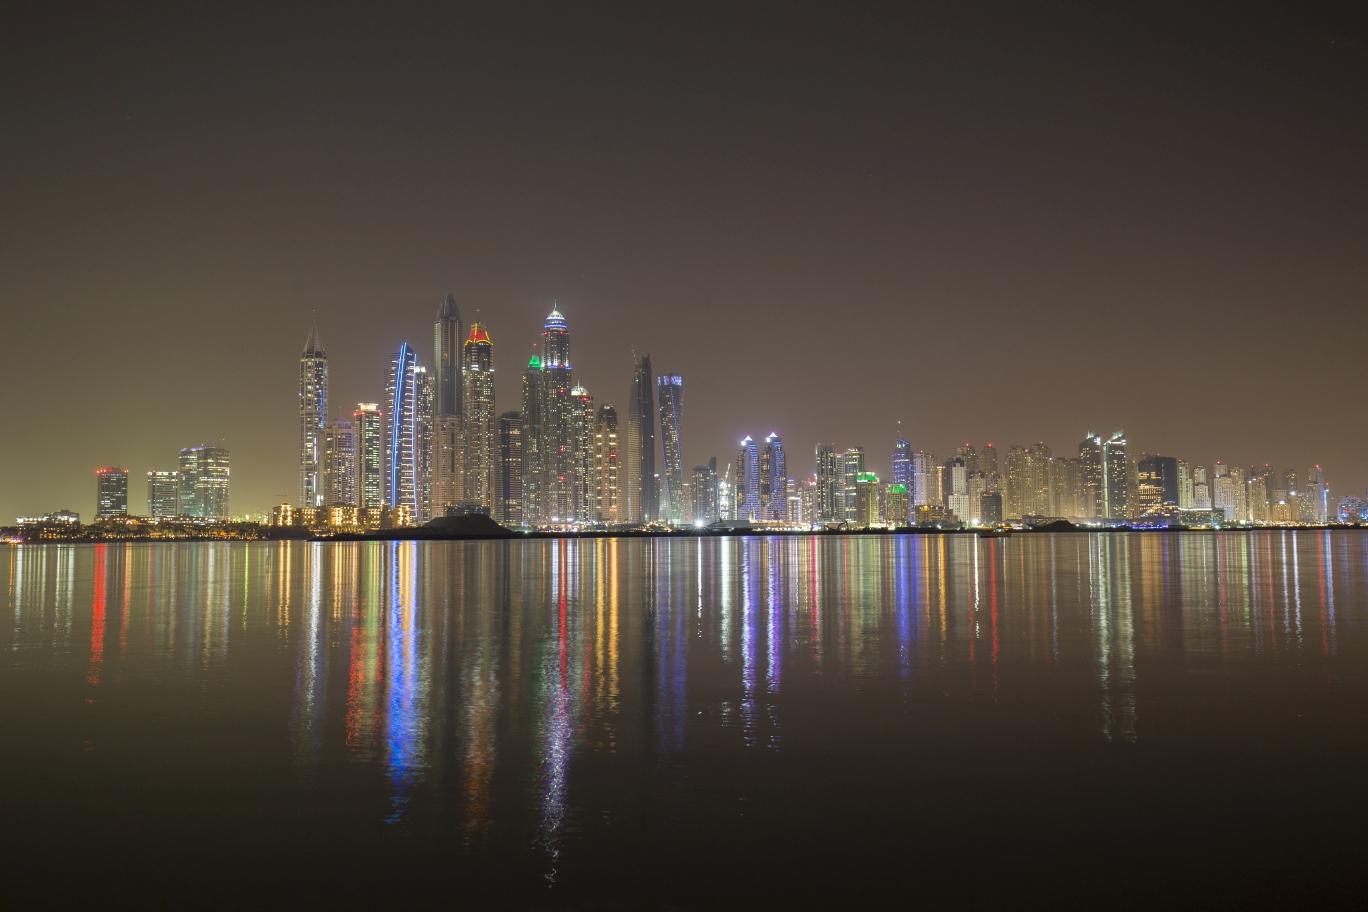 Dubai Marina view from Palm Jumeirah, United Arab Emirates